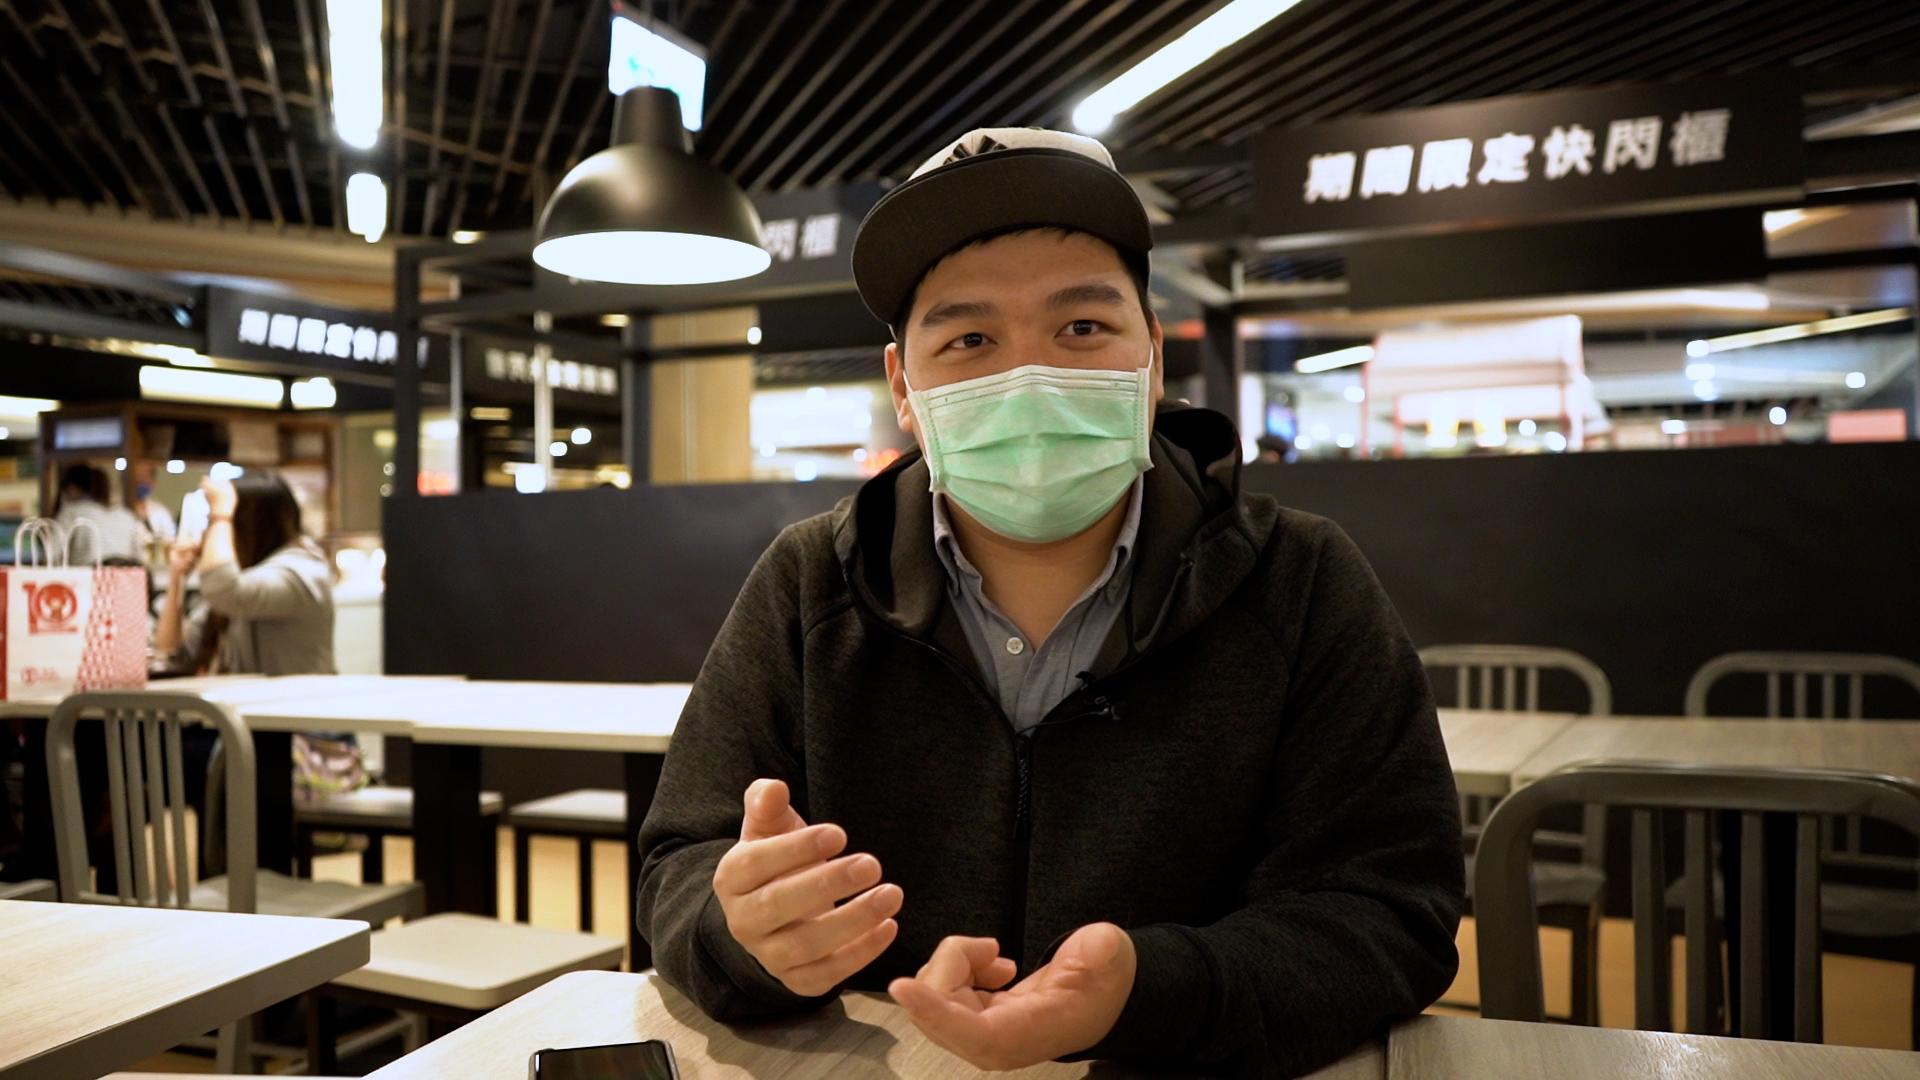 Sam覺得目前香港已難以再有任何反抗行為。他說要令國際社會援助香港,先要在海外聚集政治力量。(文海欣攝)